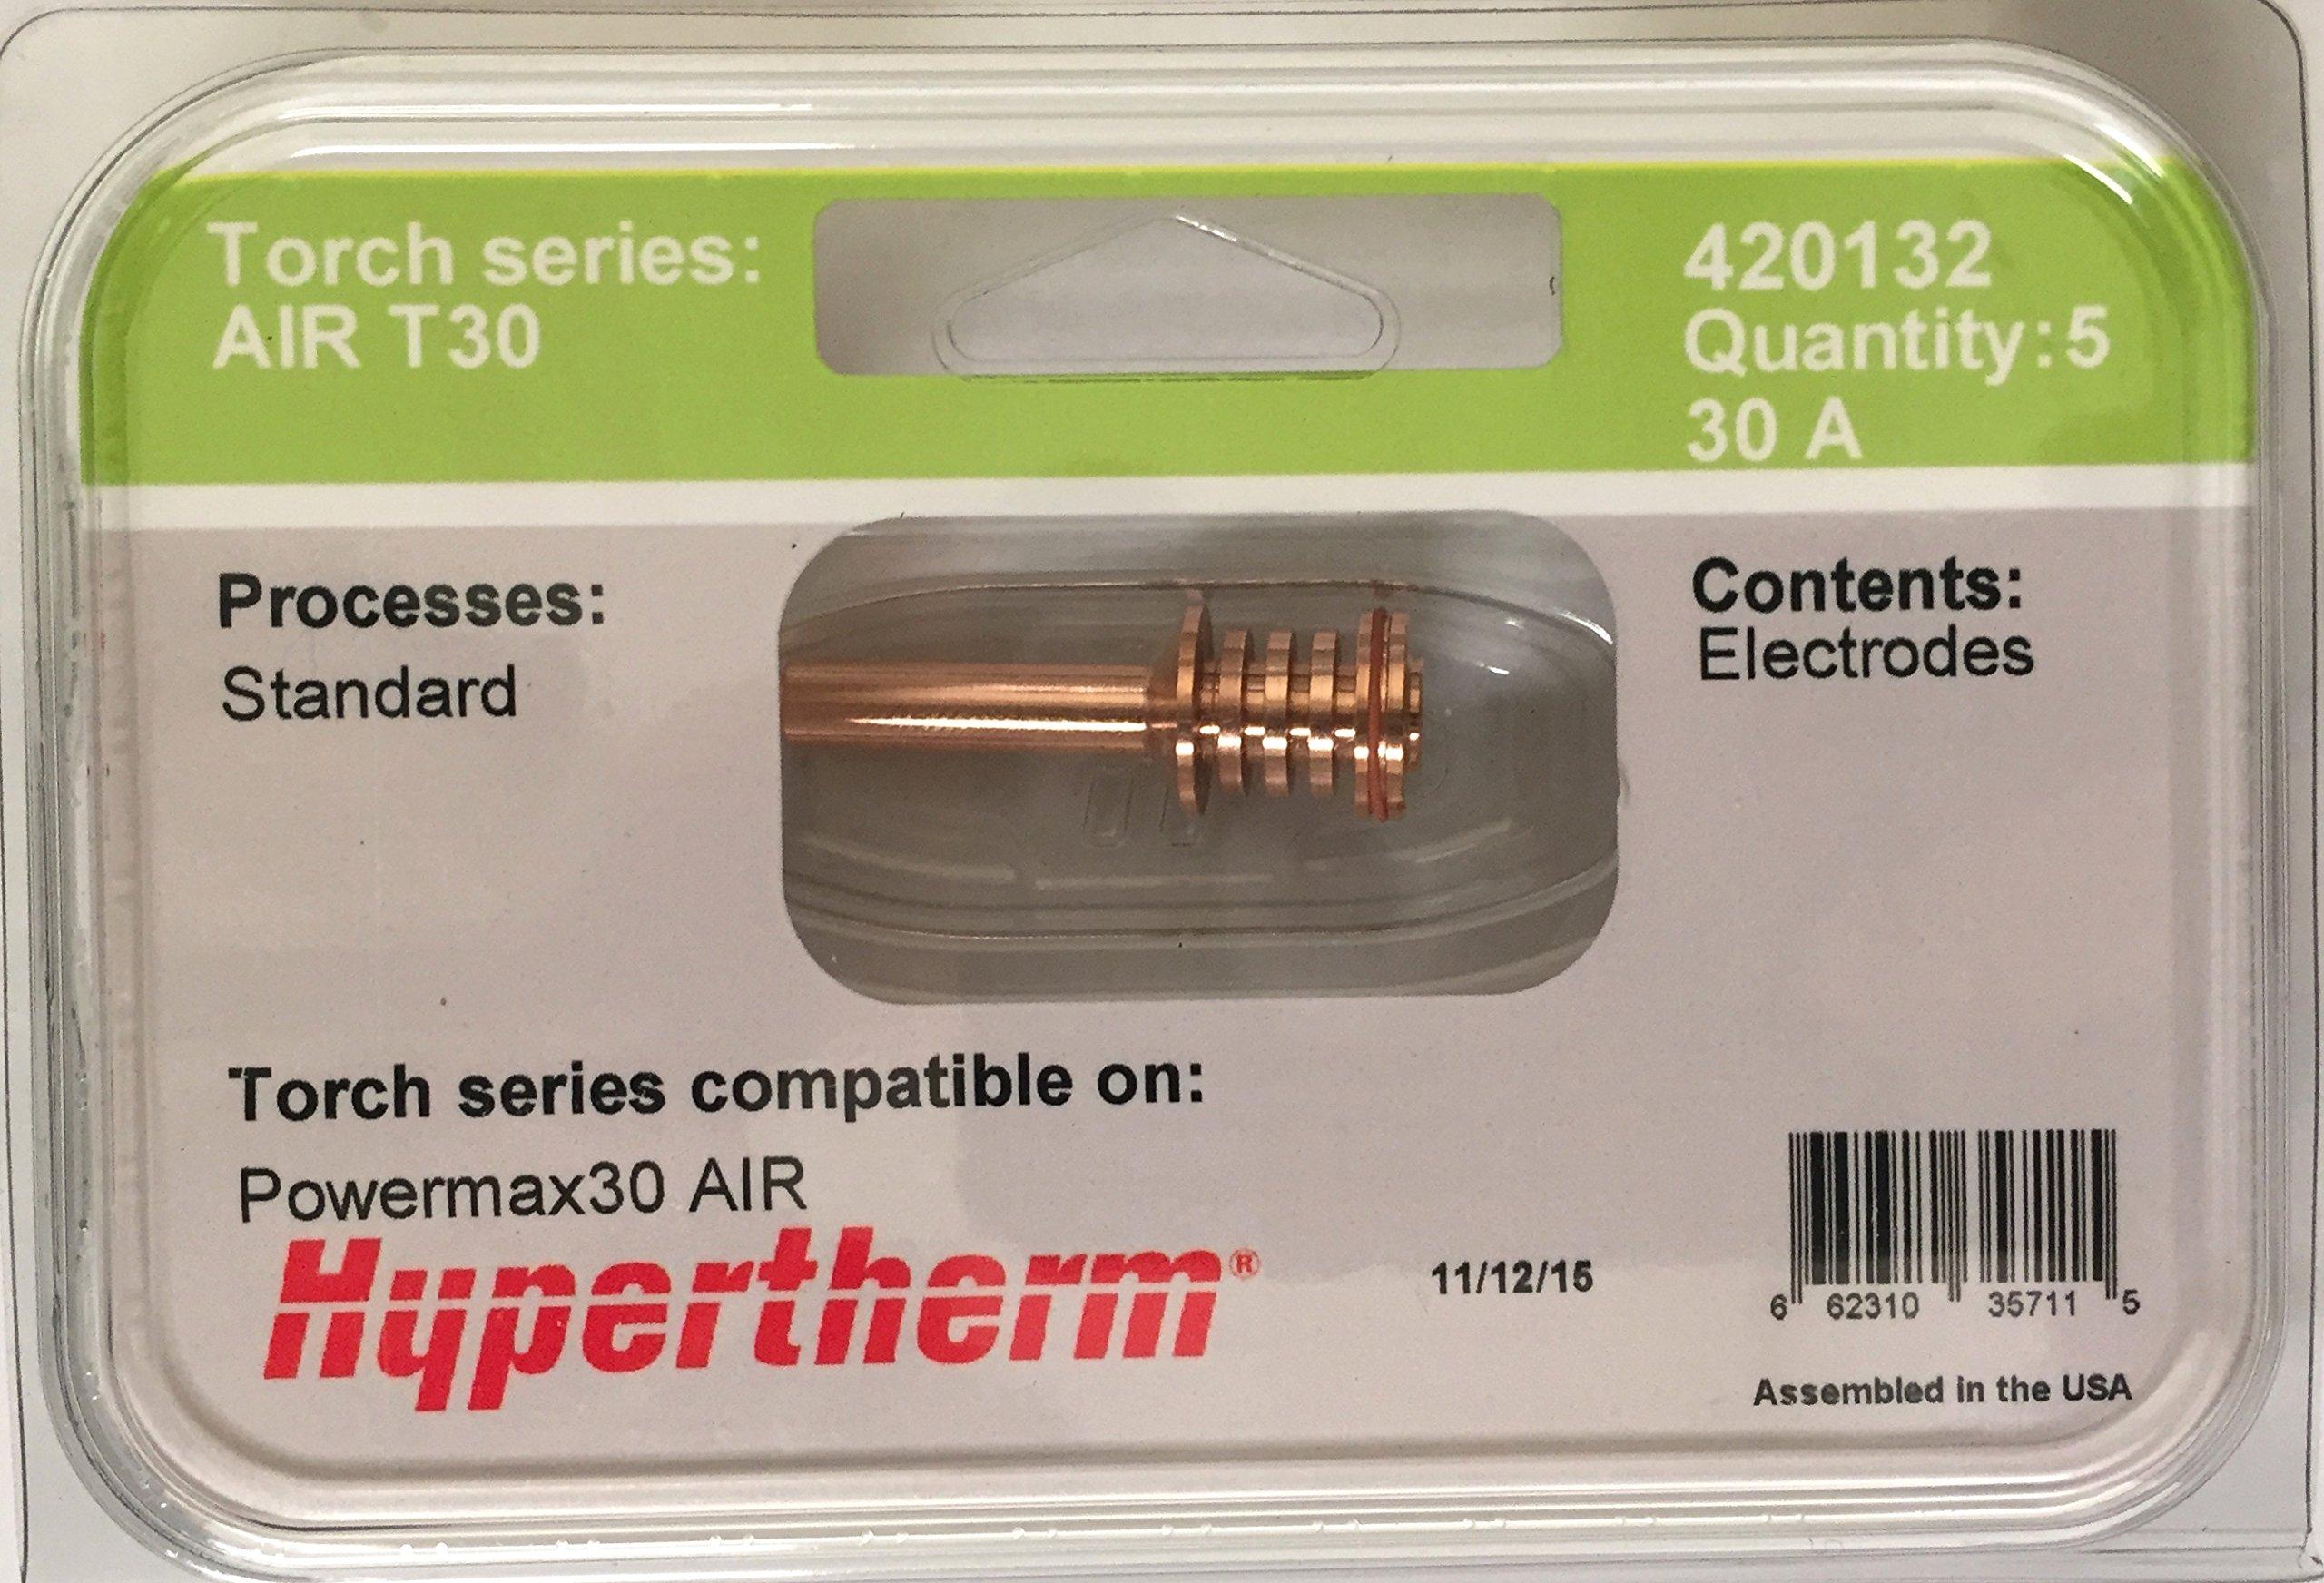 Hypertherm Powermax 30 Air 420132 Electrodes - 5 Pack